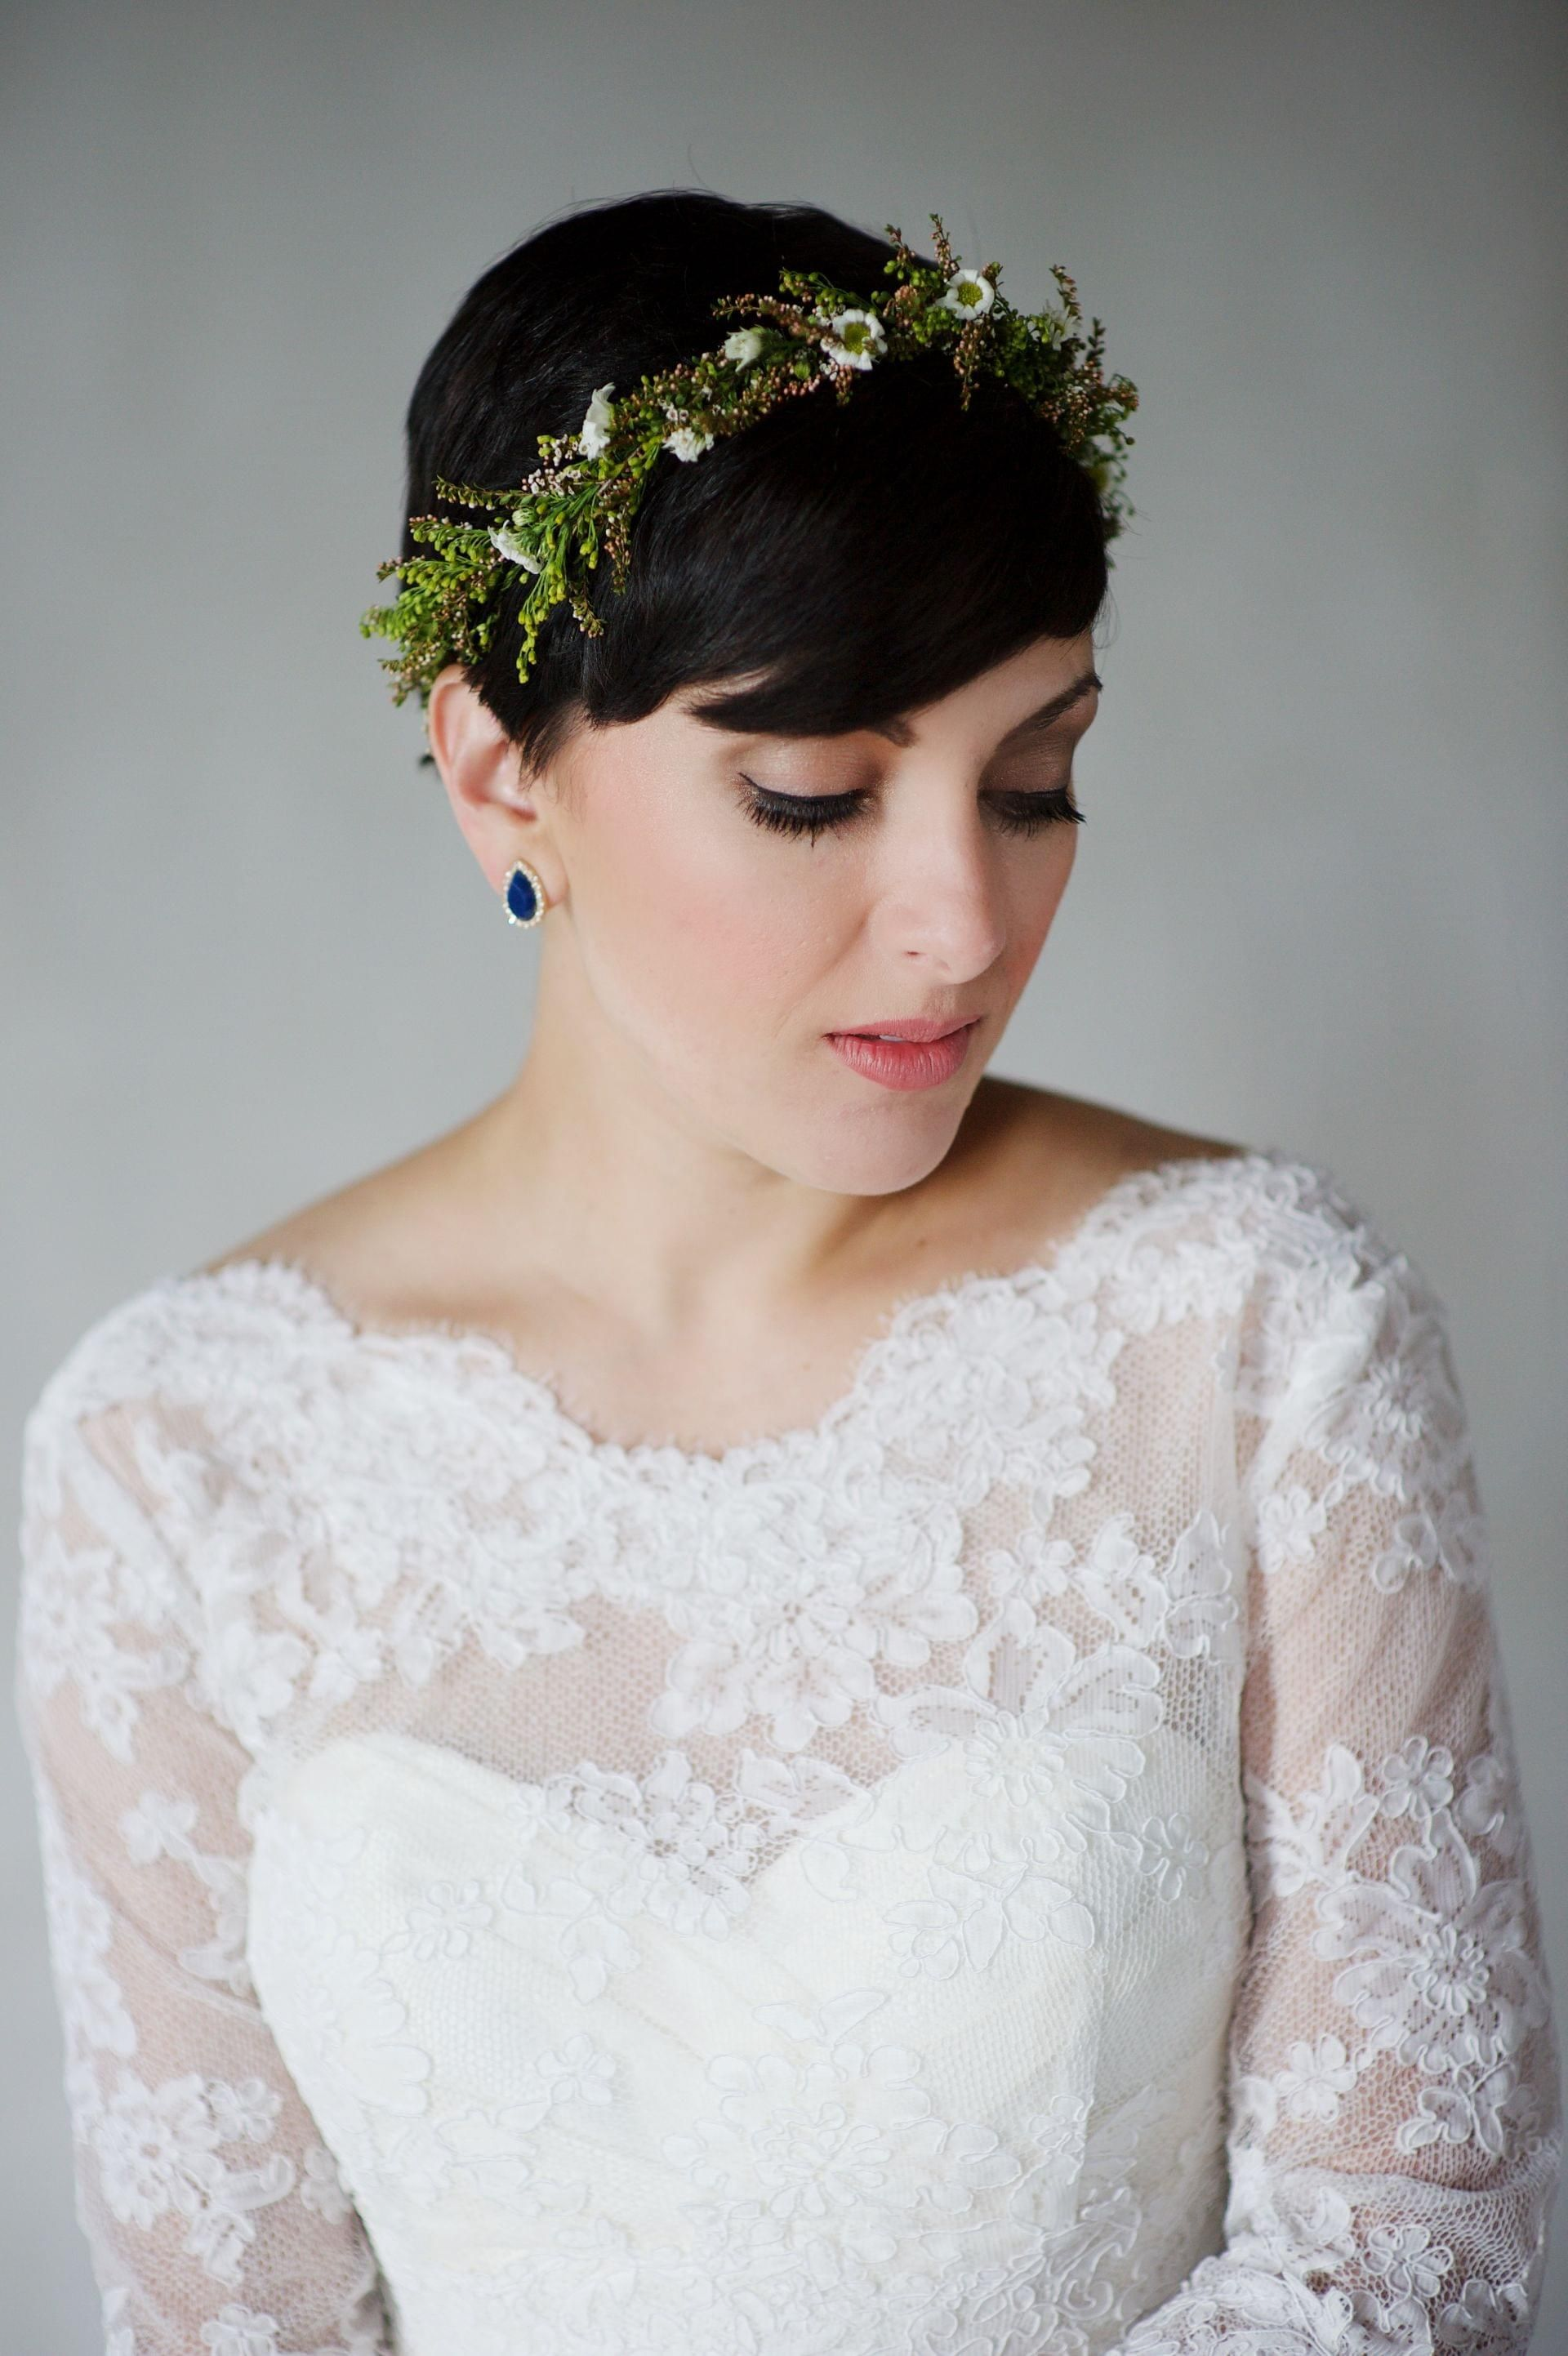 Corte de duendecillo, peinado corto de novia, corona de flores verdes naturales // Justin Wright P …